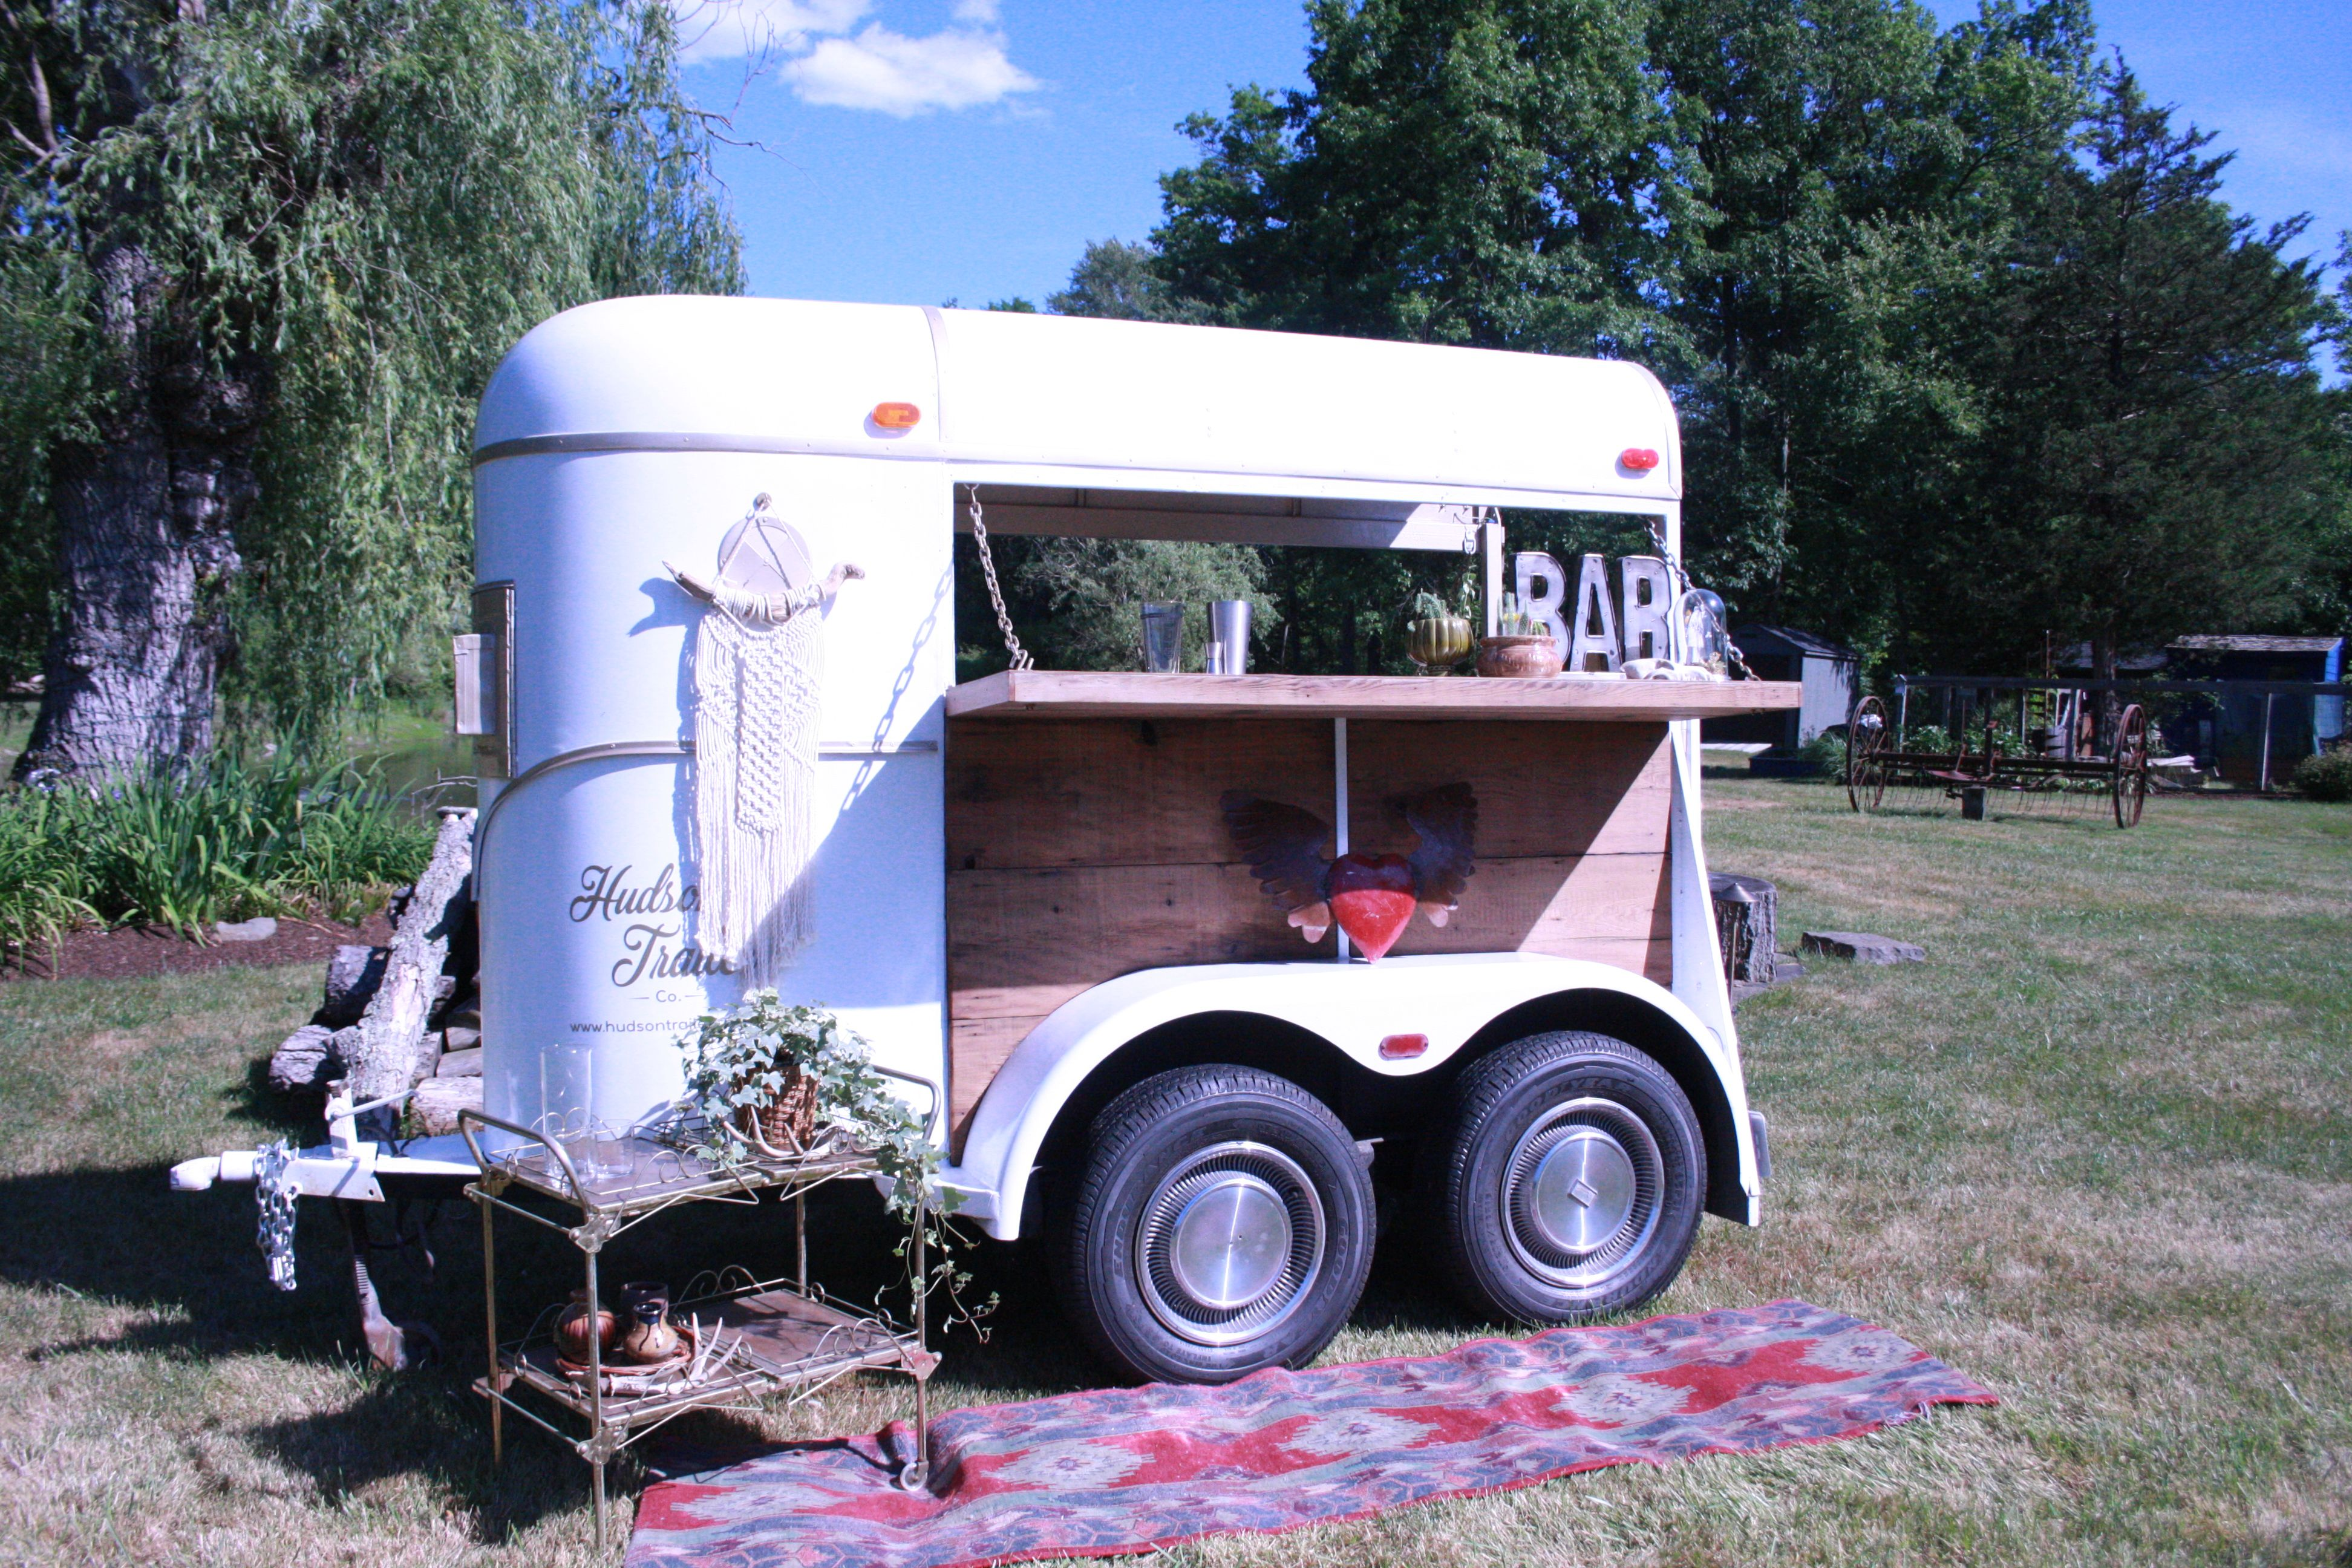 hudson trailer co camper bar trailer wedding trailer [ 3888 x 2592 Pixel ]